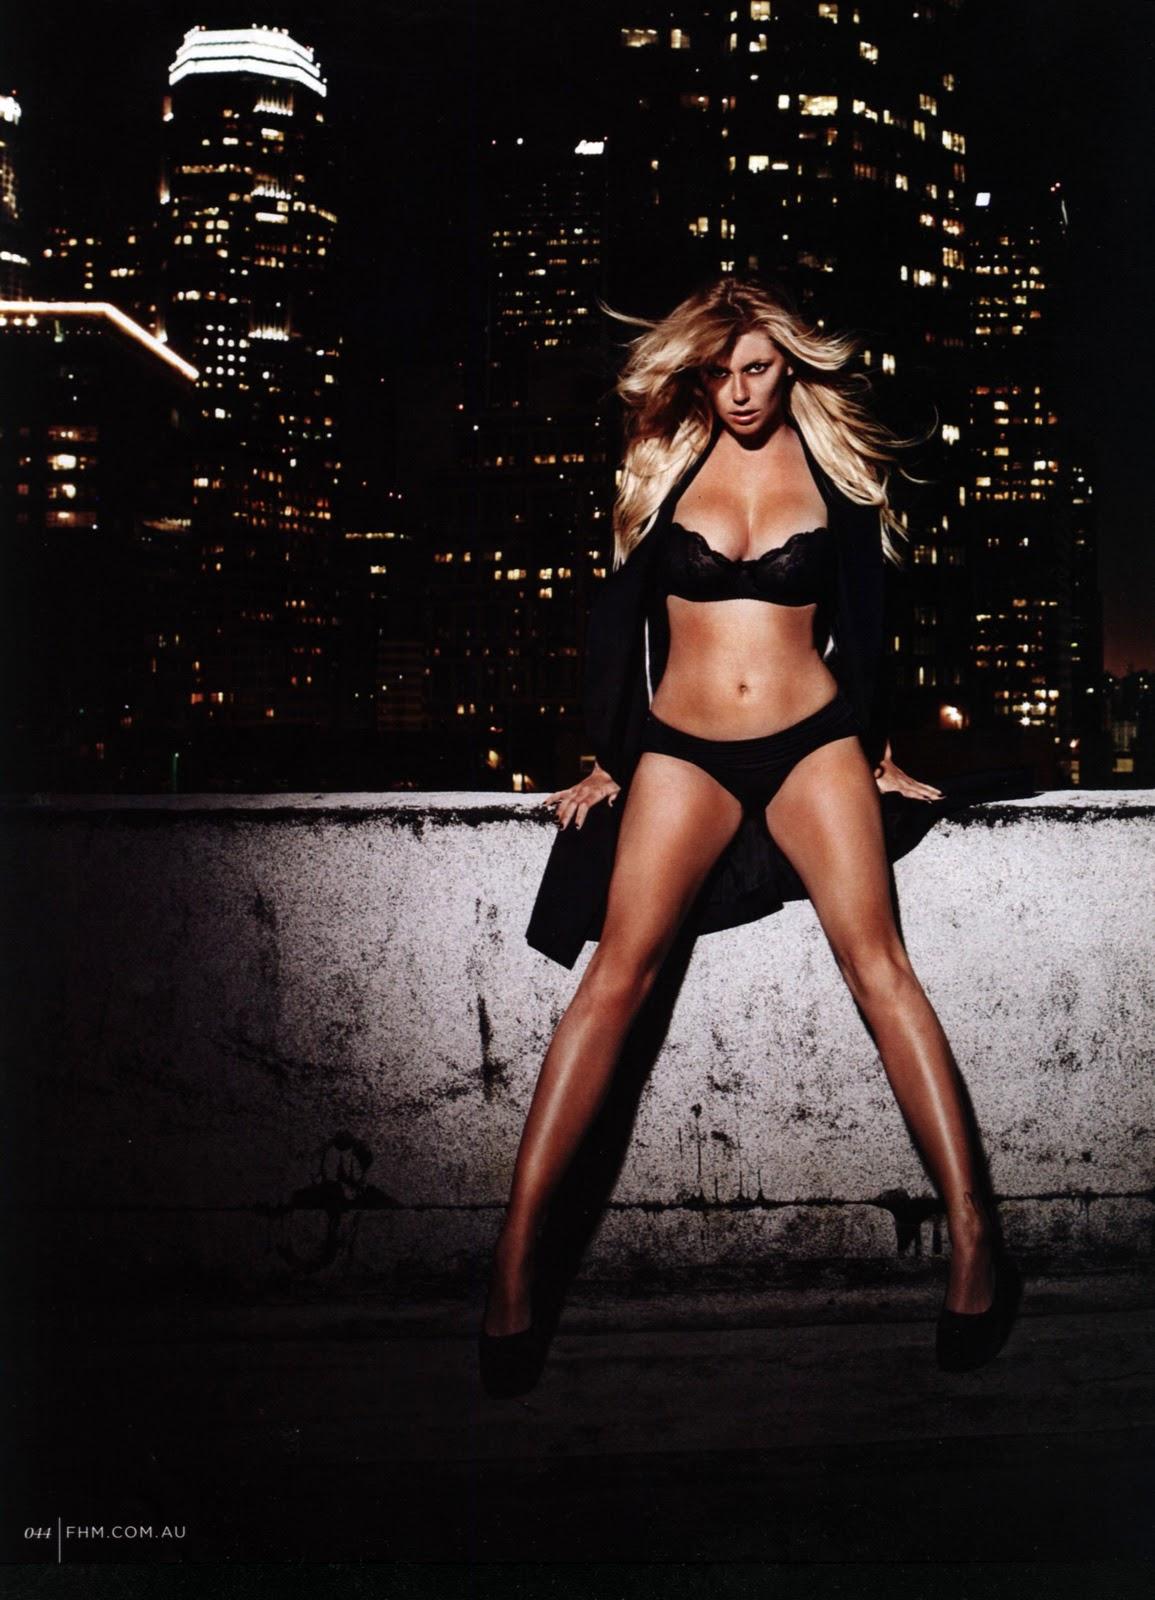 http://3.bp.blogspot.com/-lQr3yL2BXGE/TVkEa4oENaI/AAAAAAAAIb4/_A5Ecw3f6f0/s1600/Diora+Baird+%25E2%2580%2593+FHM+Magazine+Australia+March+2011+%25281%2529.jpg